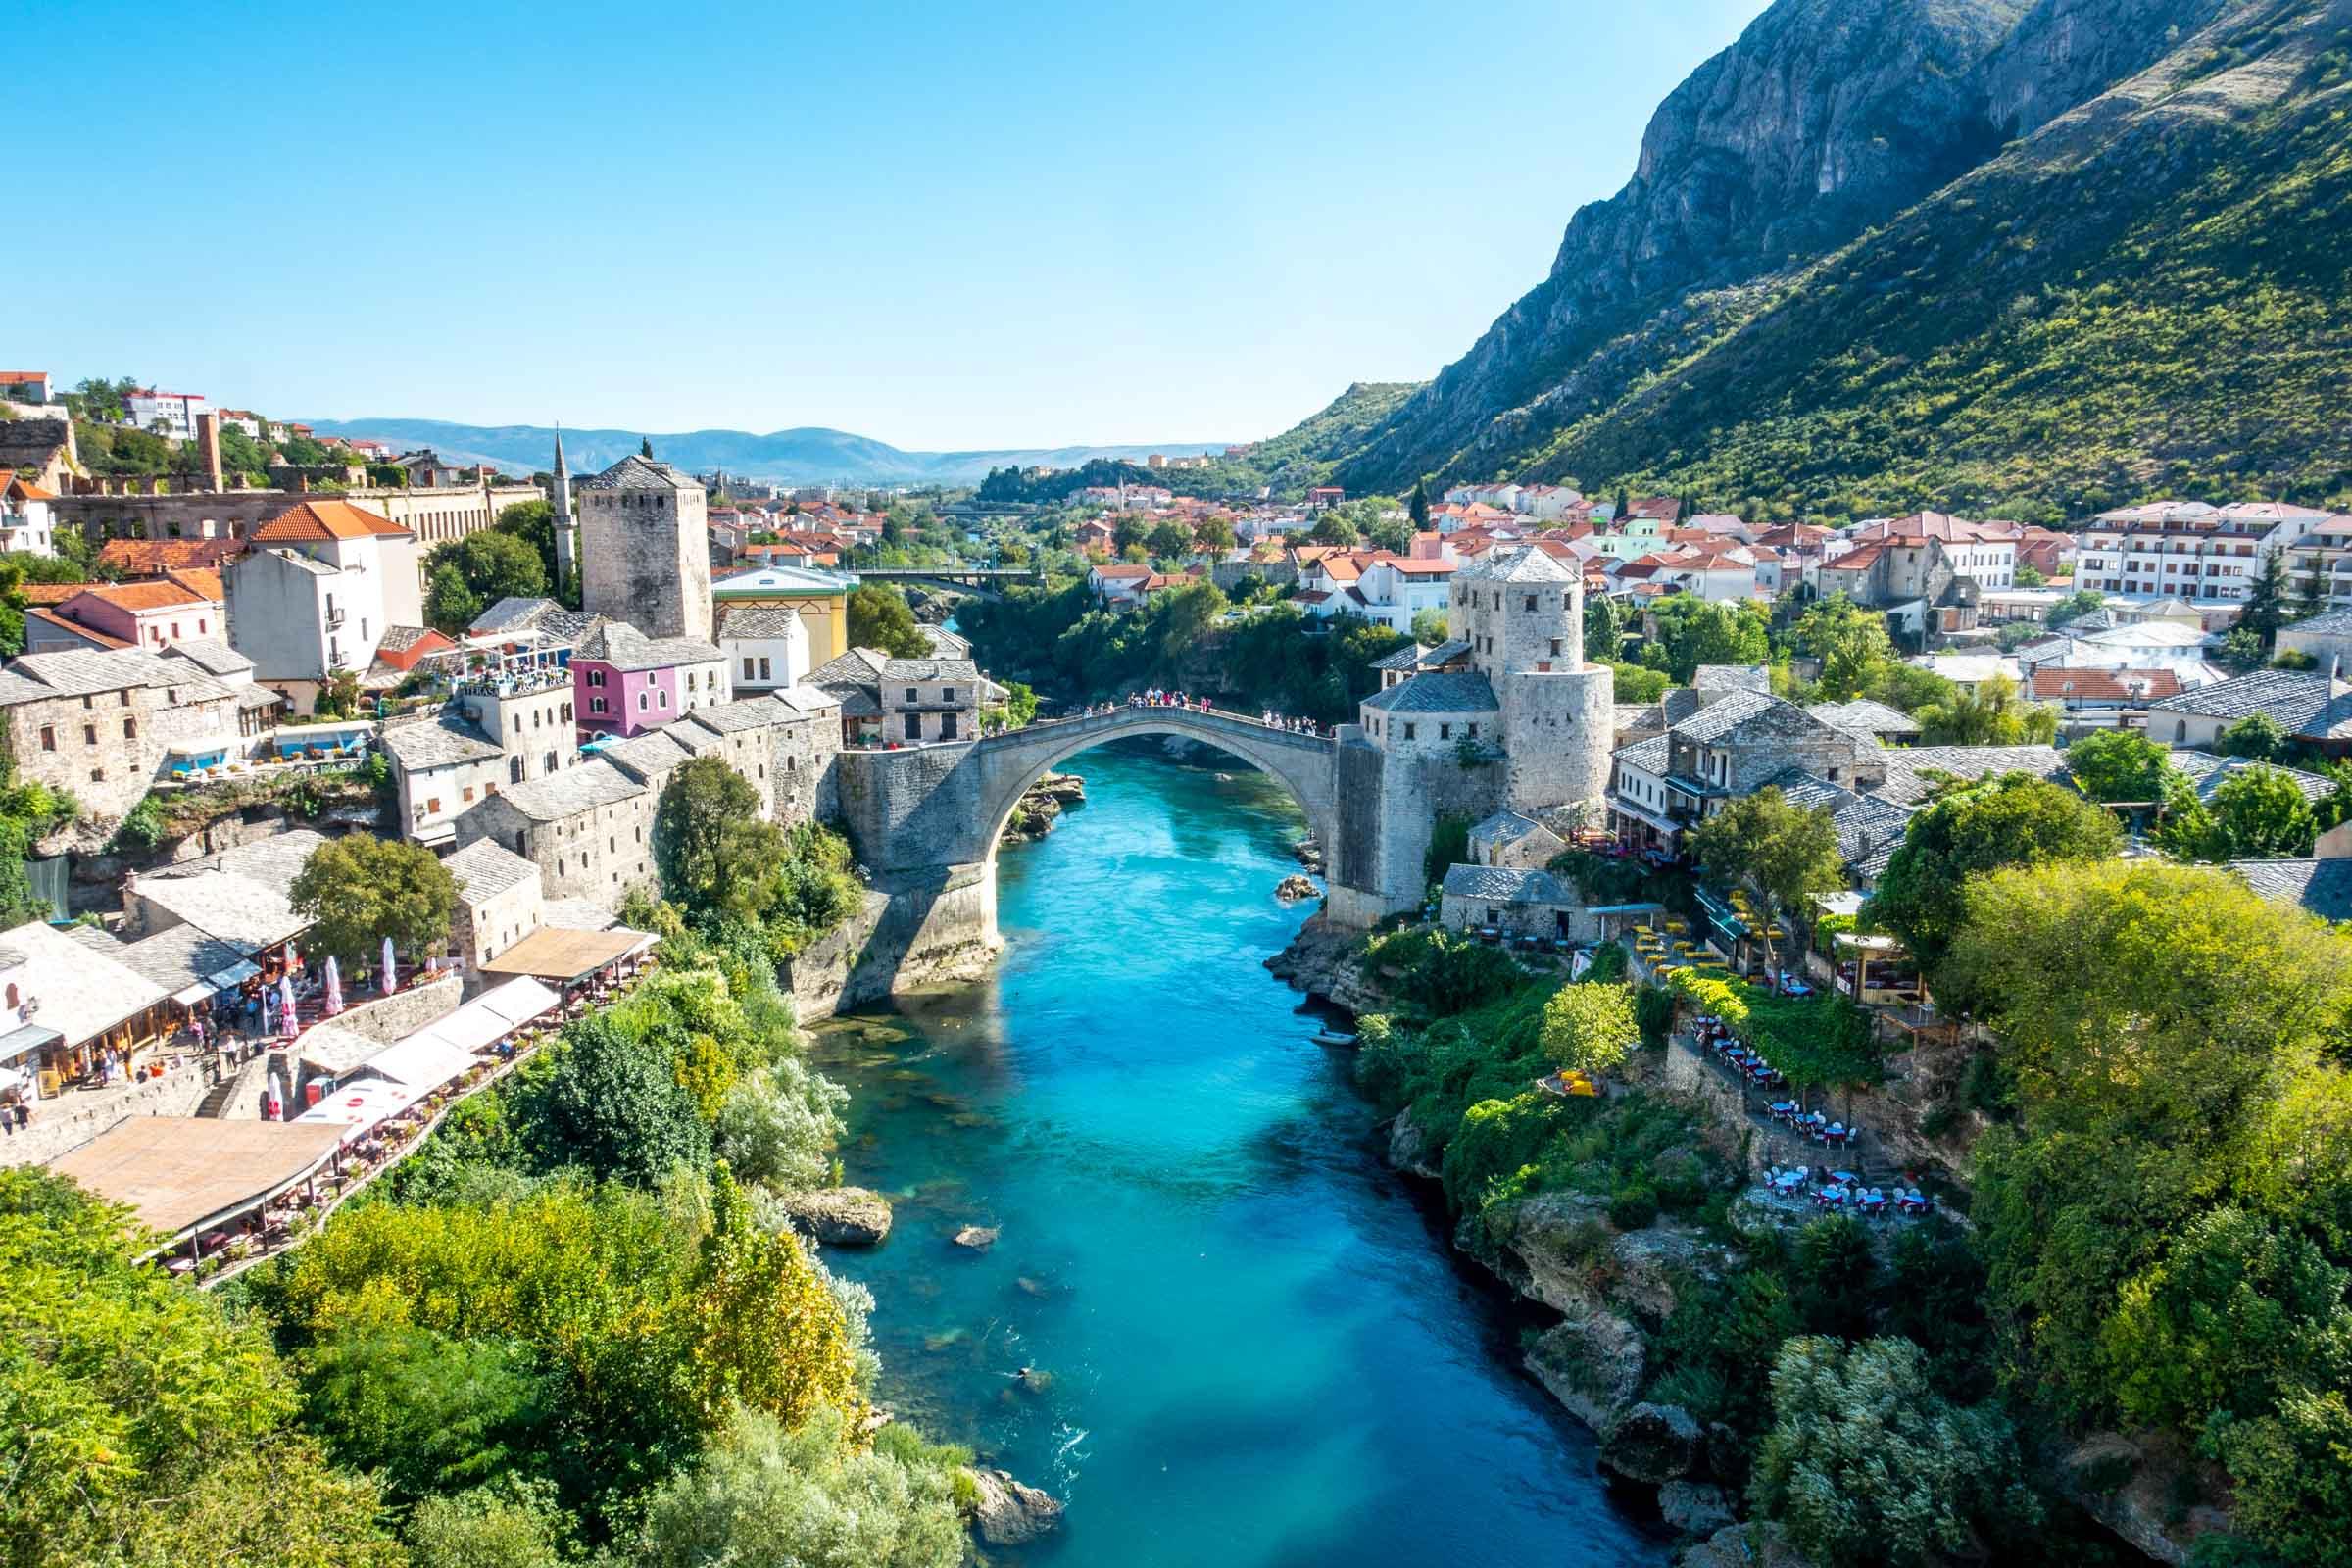 Stari Most bridge and Old Town Mostar, Bosnia and Herzegovina